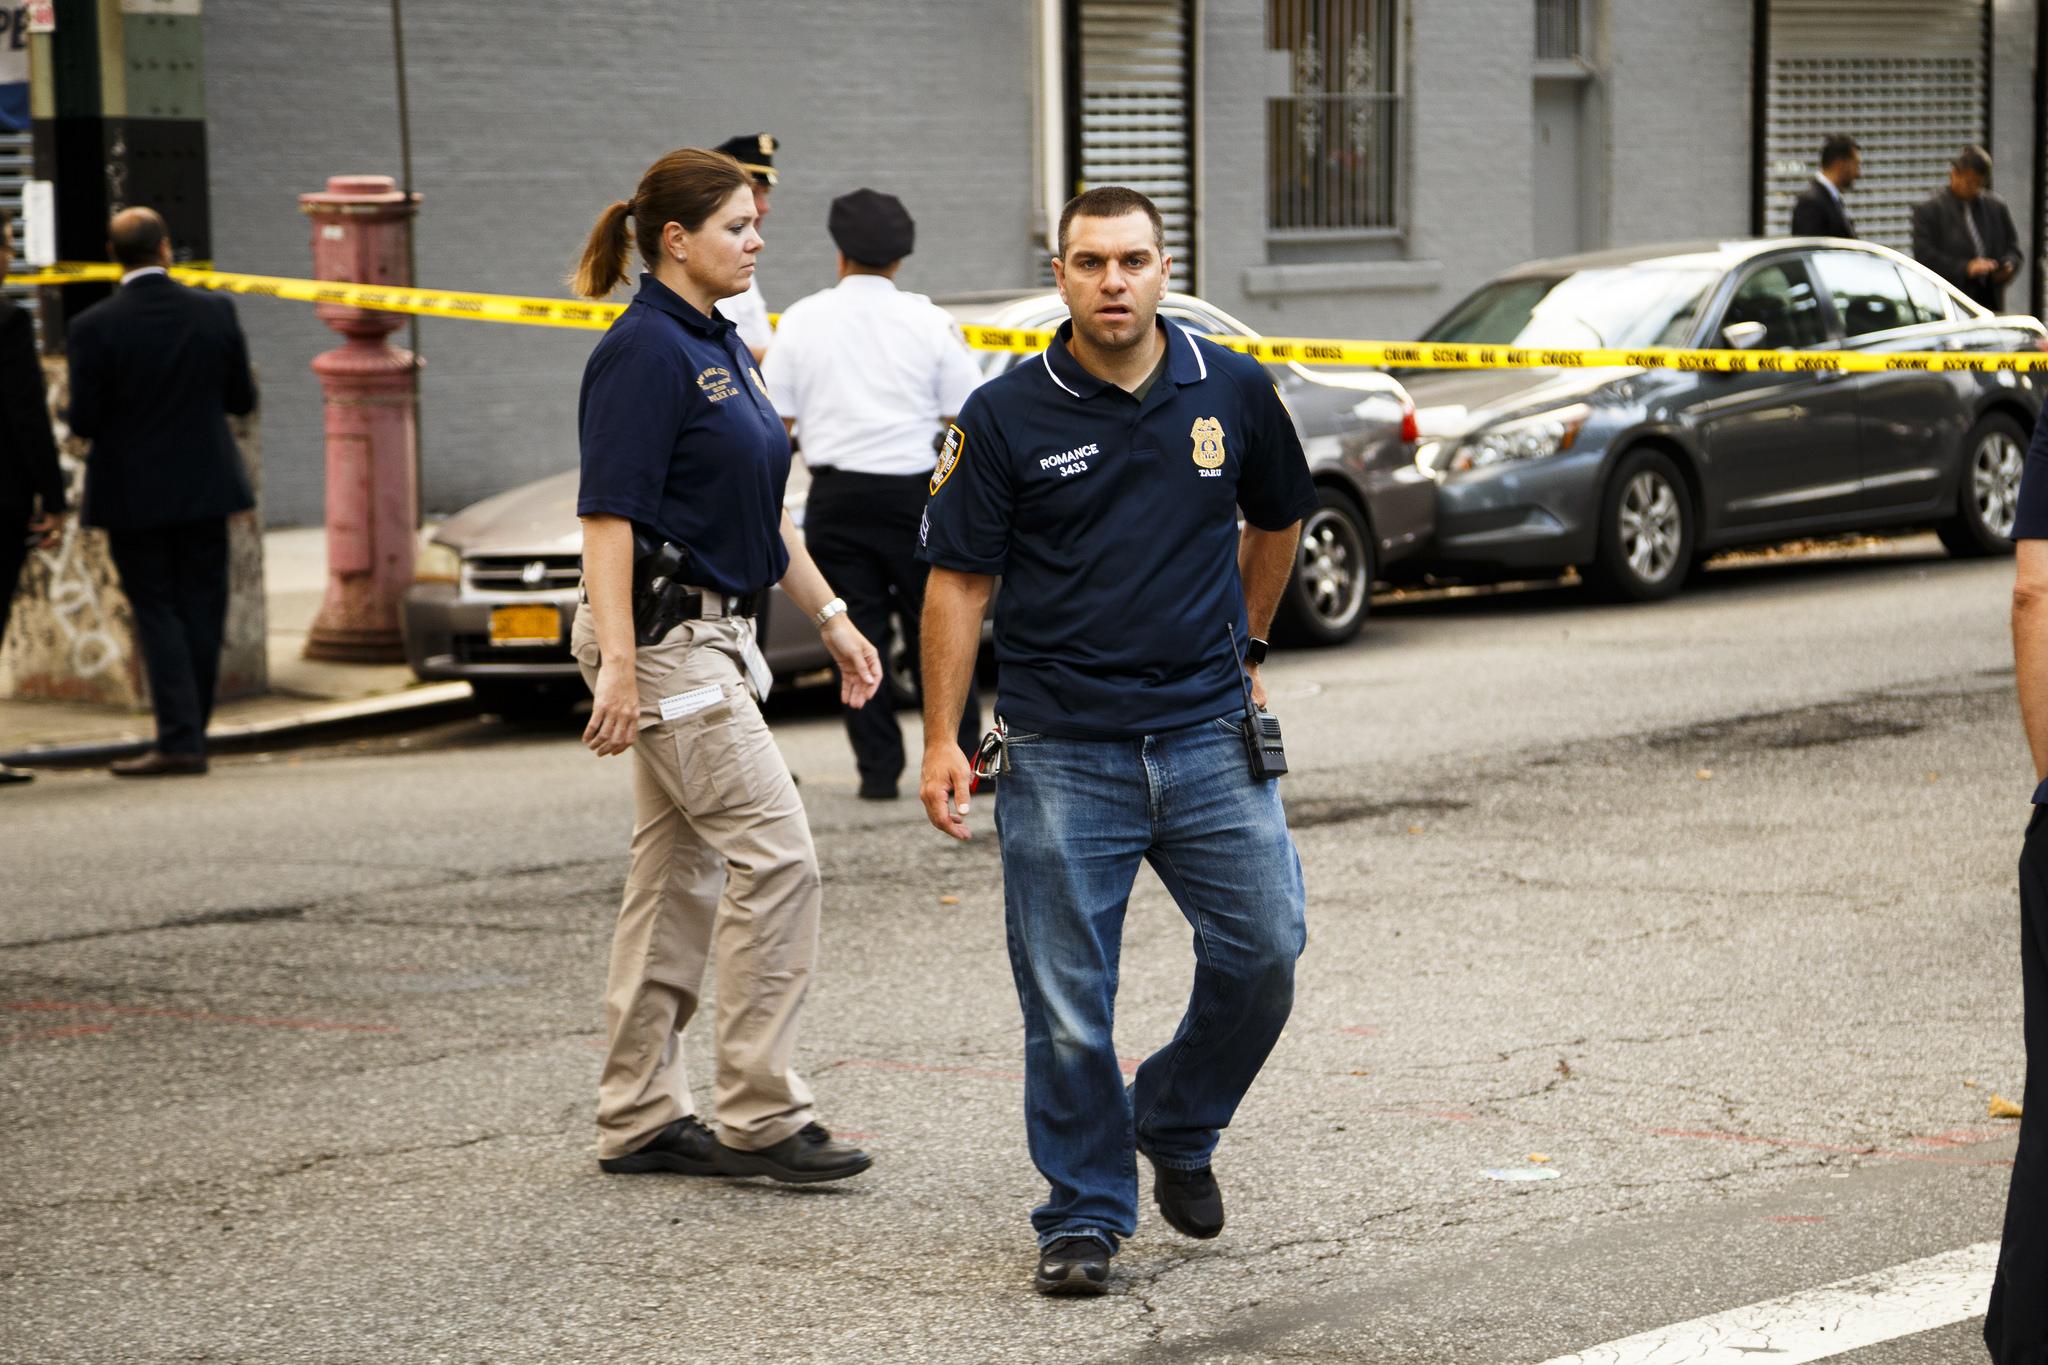 The cop shot the kid, same old scene